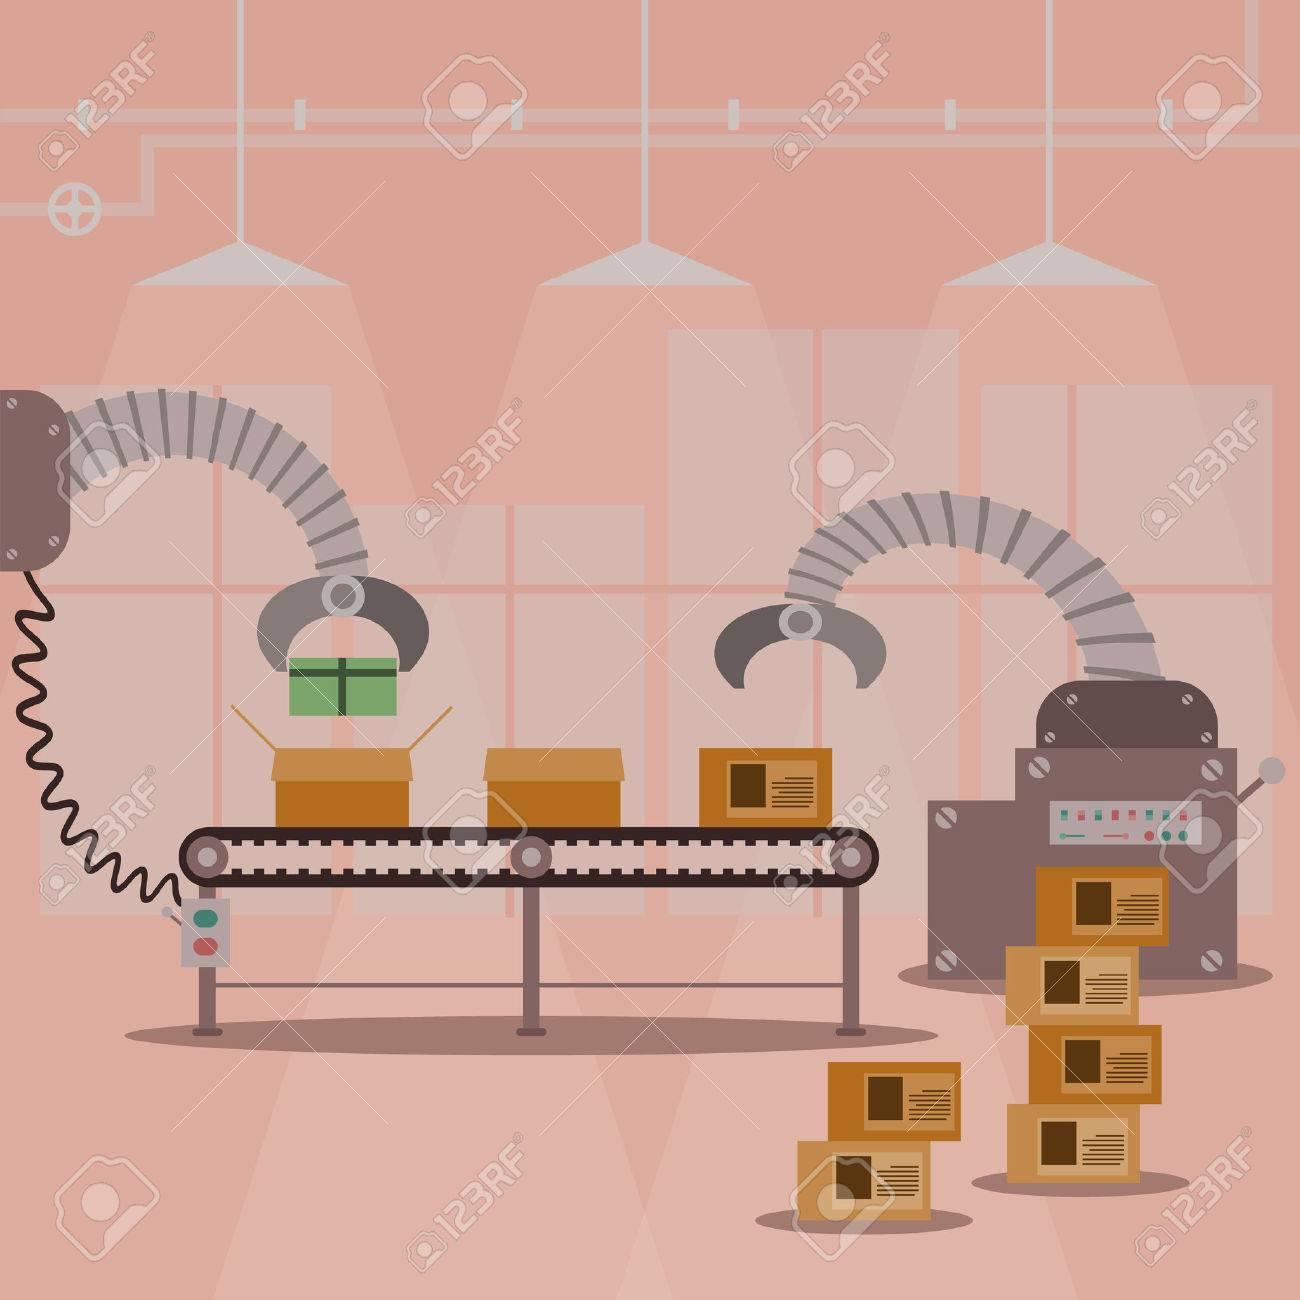 Gift box production factory machine. Vector illustration design. - 35161701